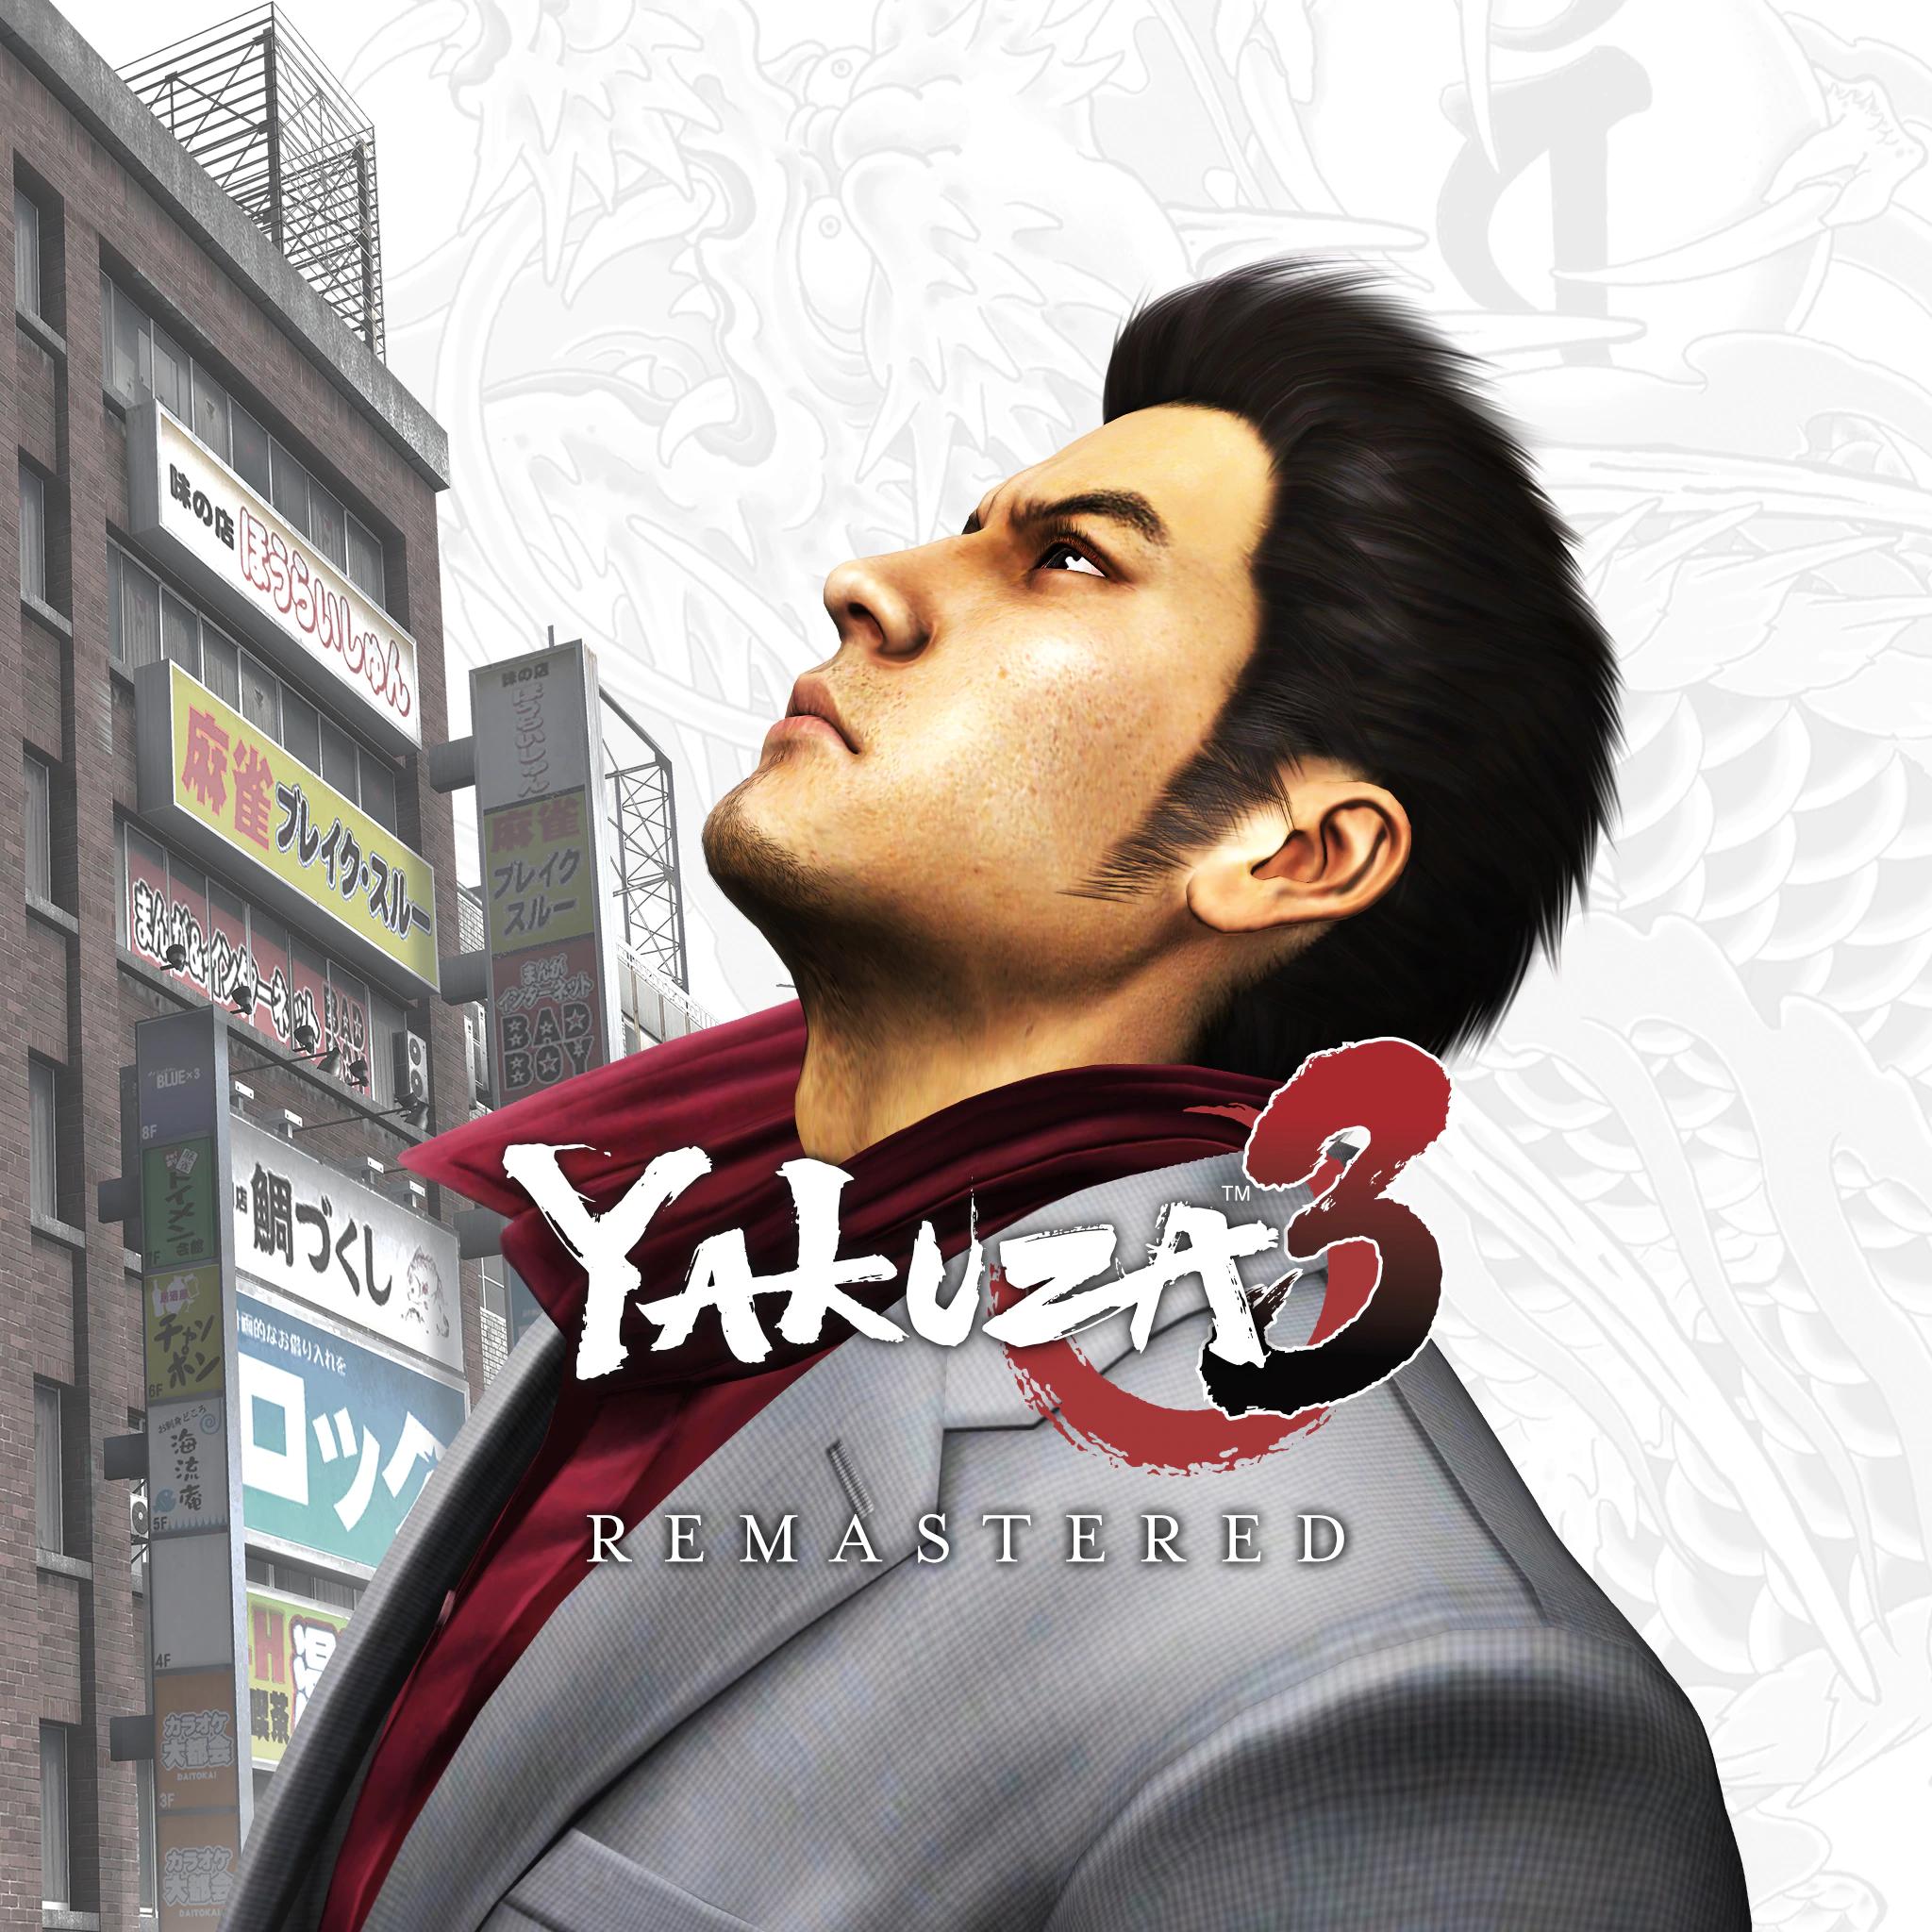 Yakuza 3 Remastered, 4 Remastered ou 5 Remastered sur PS4 (dématérialisés)